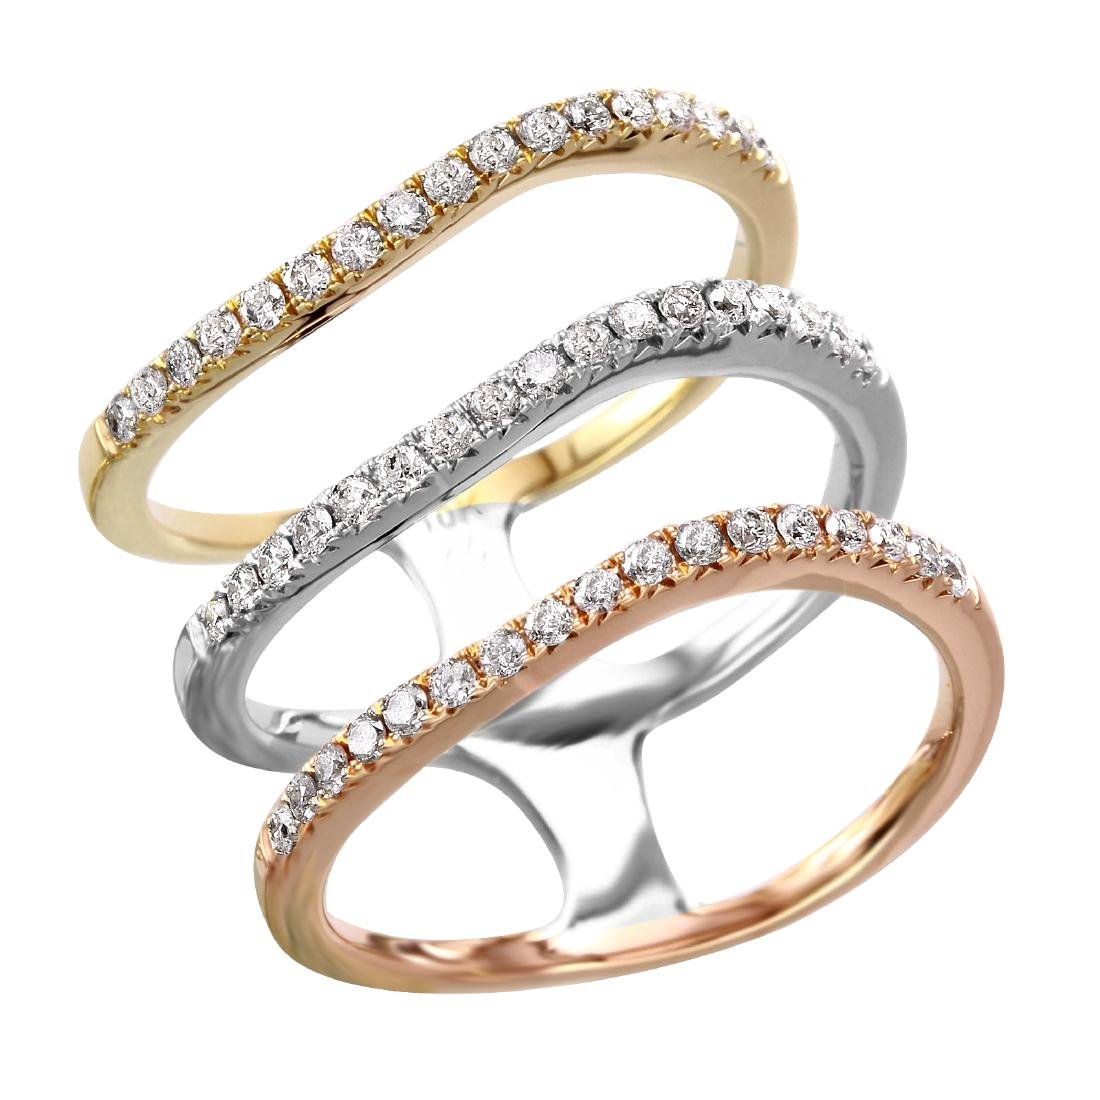 10KT Tri-Gold Diamond Ring